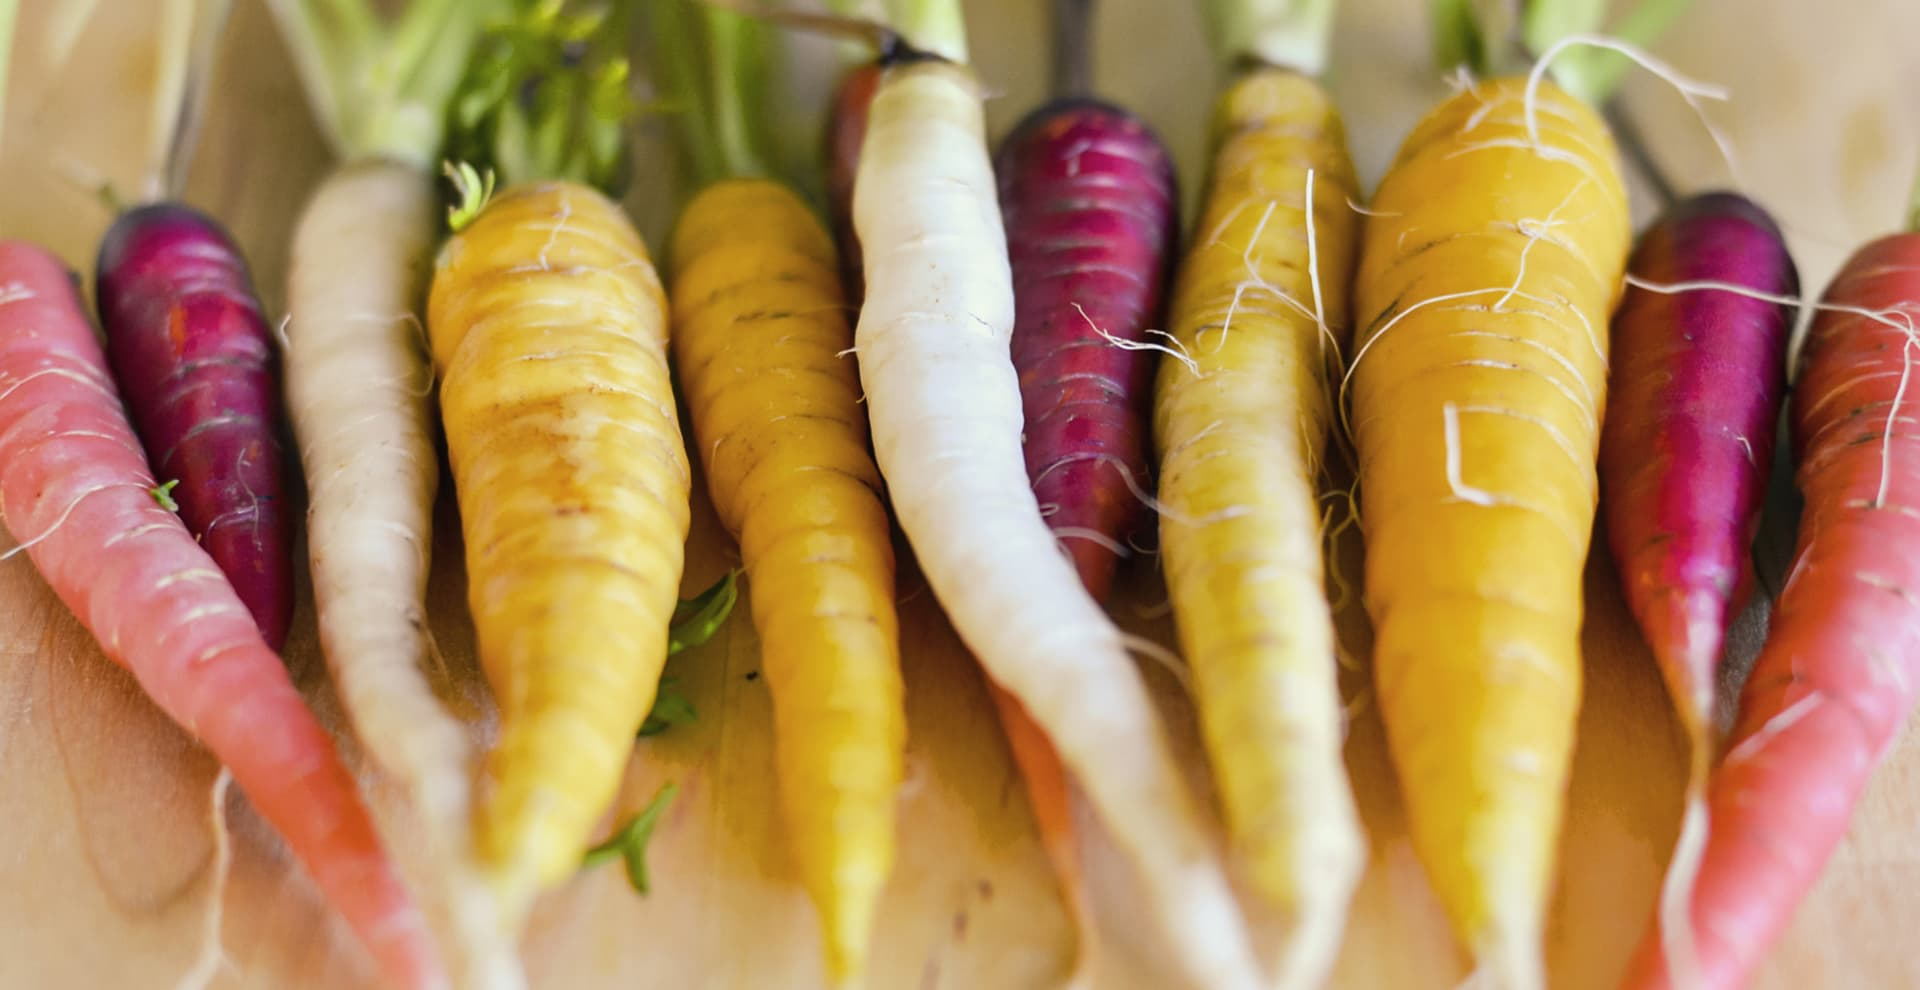 Raddish - Plant Food